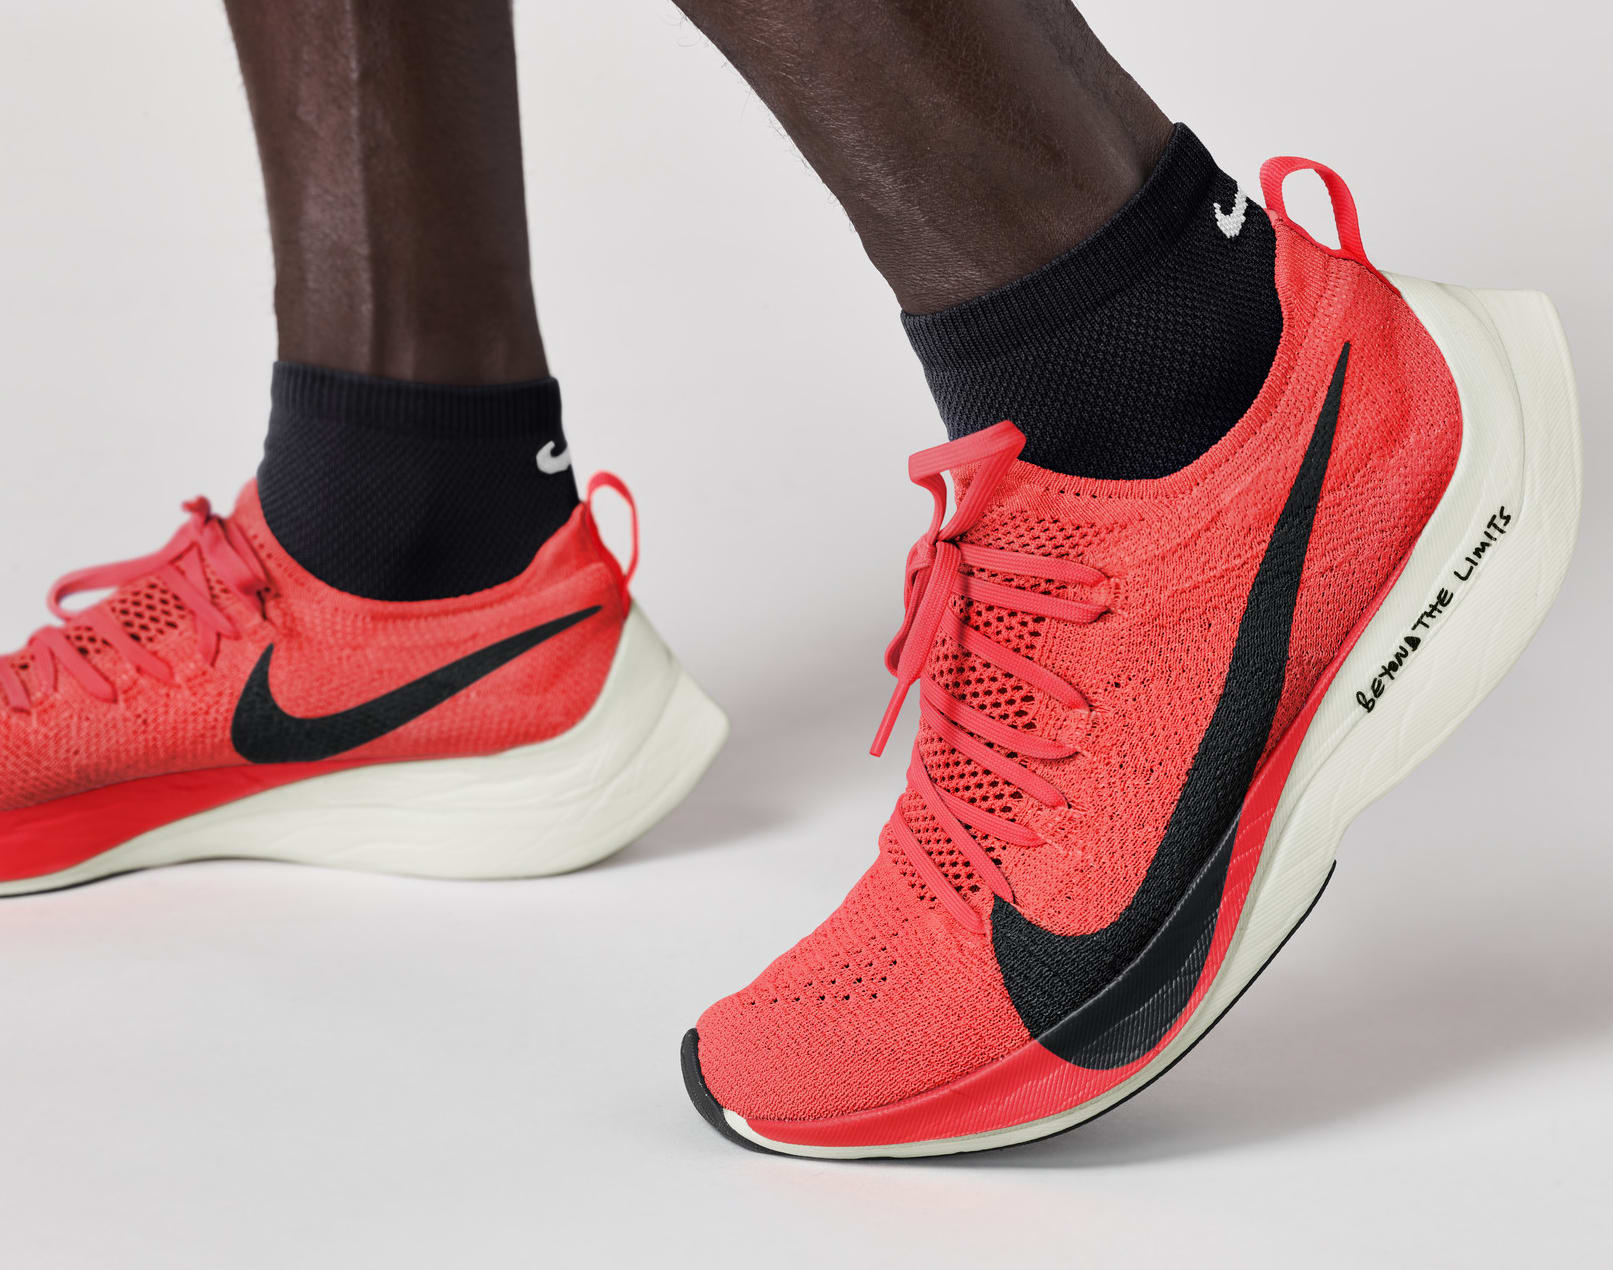 Eliud Kipchoge Wearing Nike Zoom VaporFly Elite